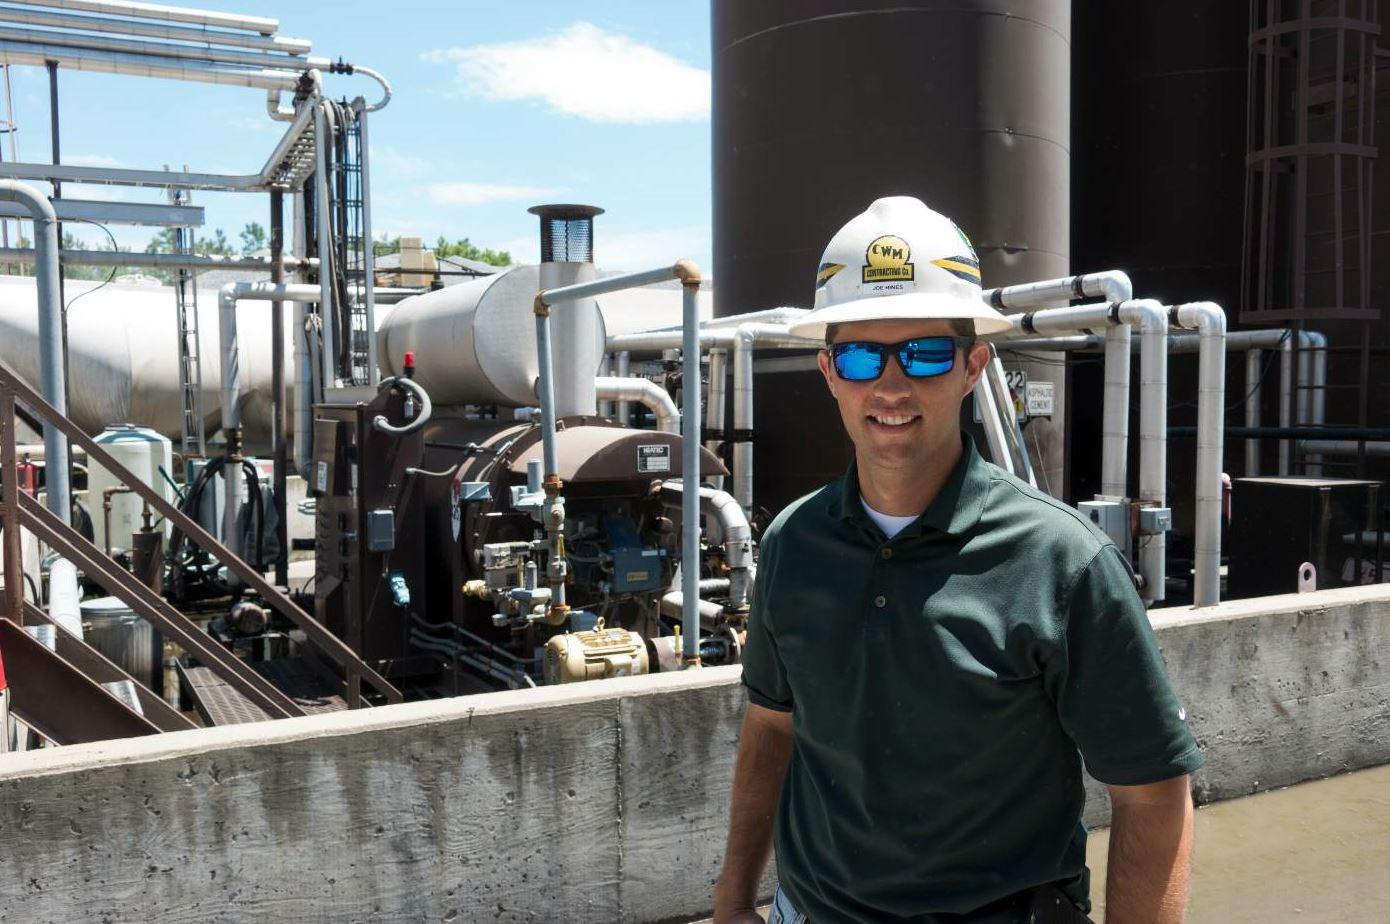 Joe Hines is the superintendent of asphalt plants for C.W. Matthews.